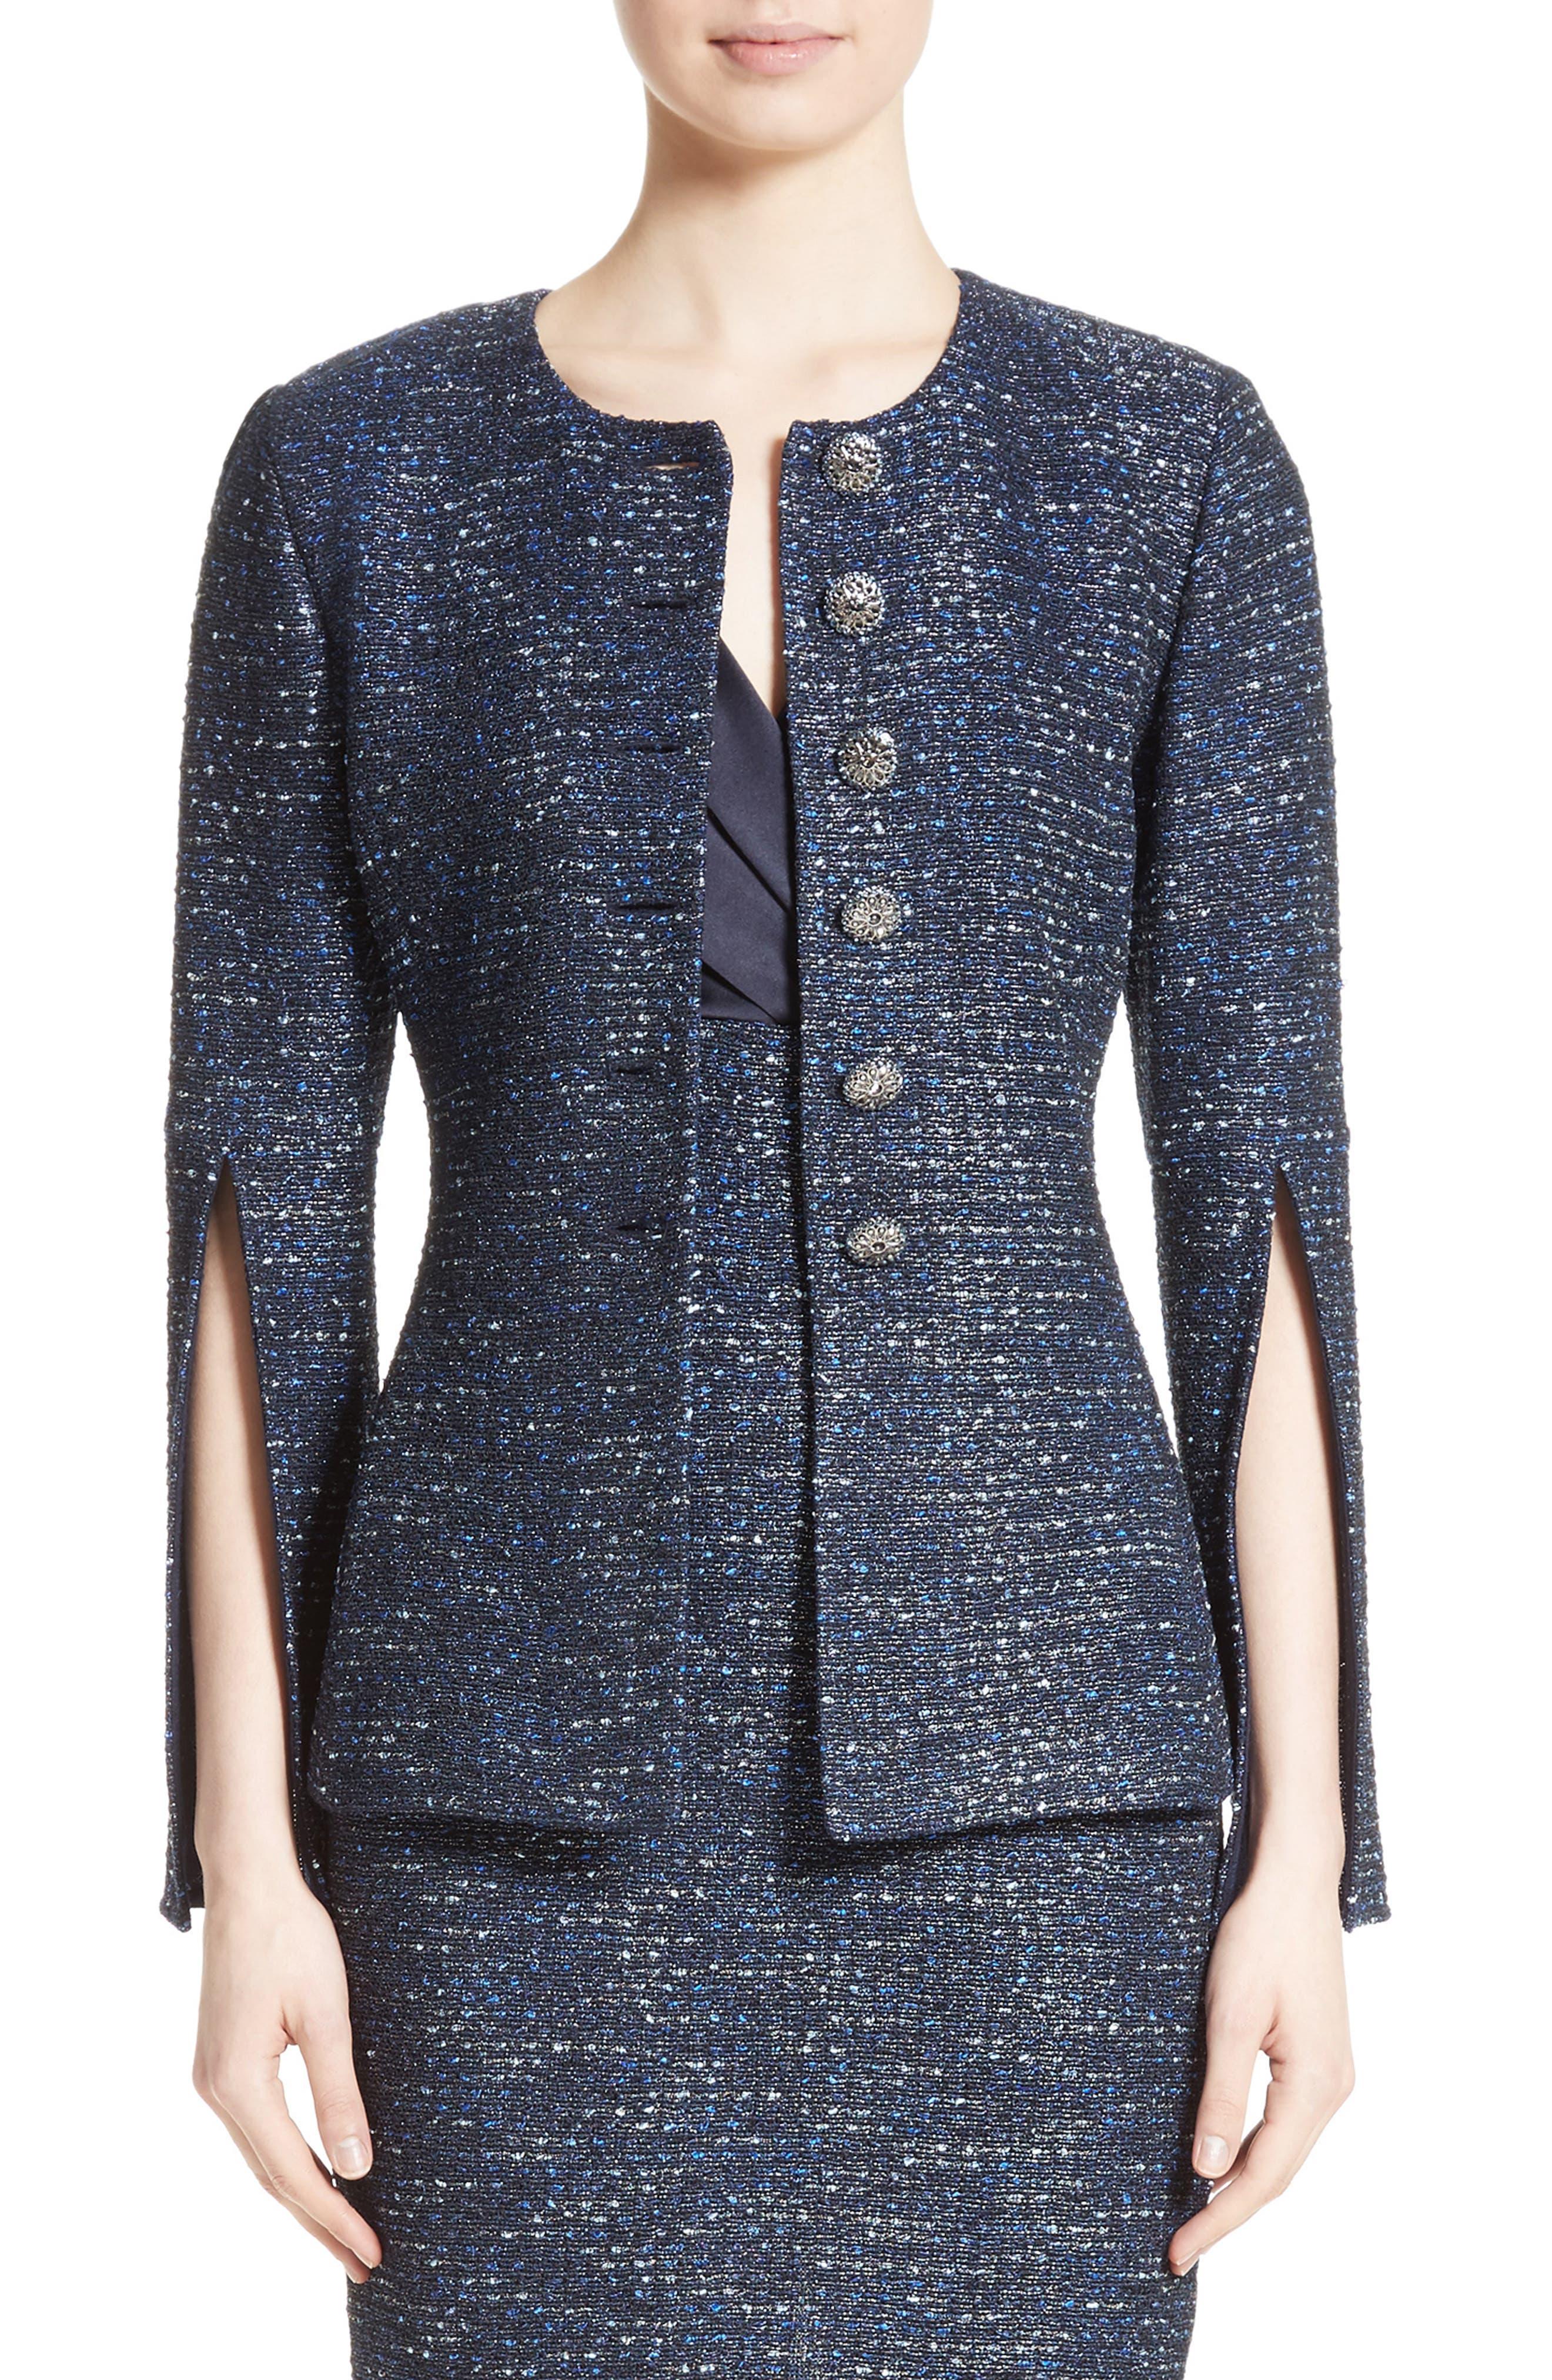 Alternate Image 1 Selected - St. John Collection Alisha Sparkle Tweed Jacket